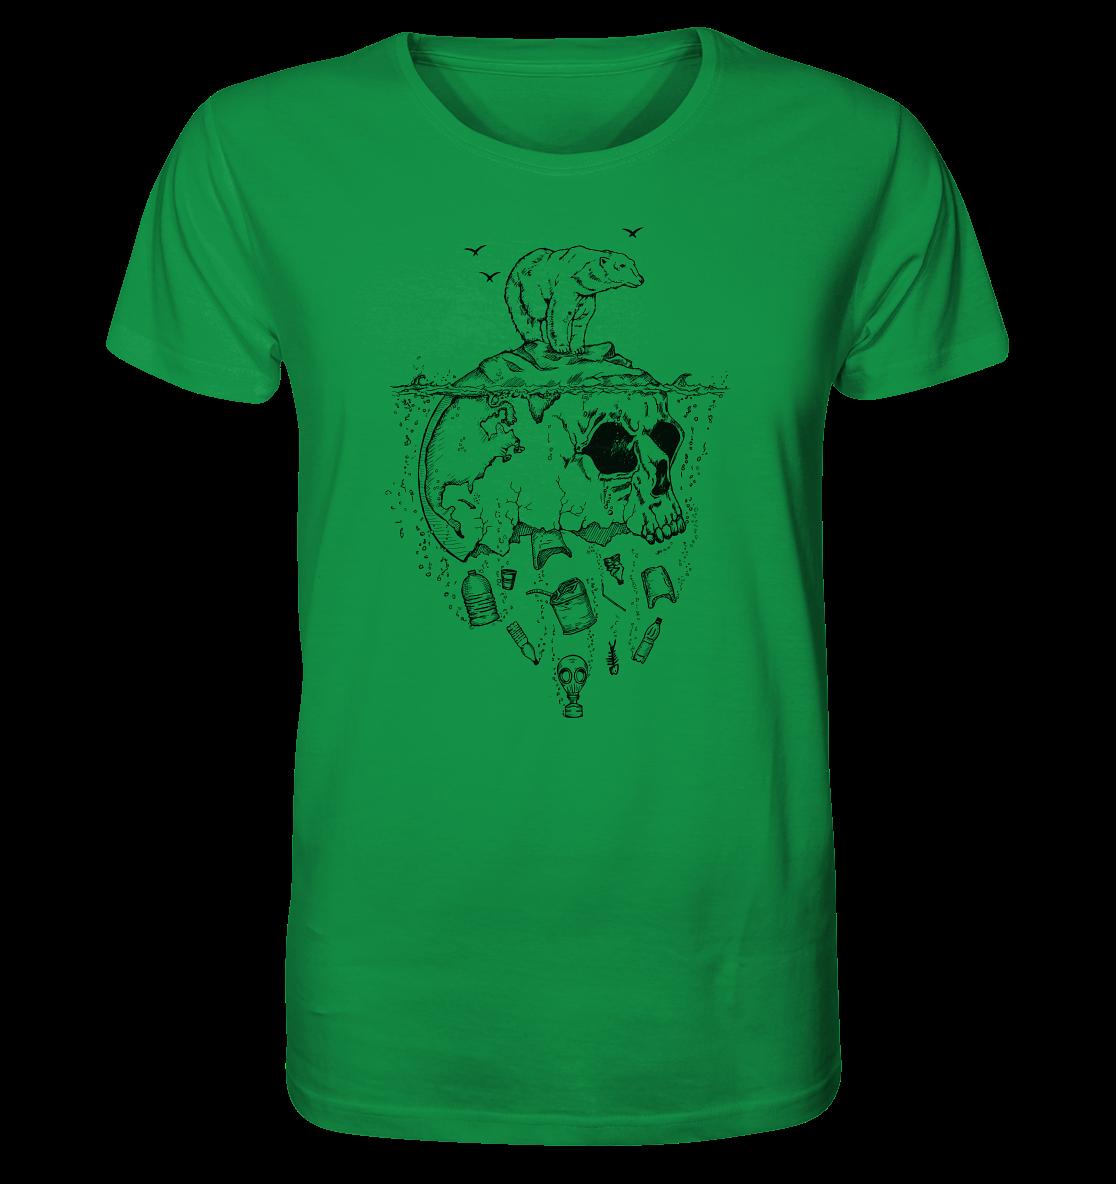 front-organic-shirt-149348-1116x-5.png